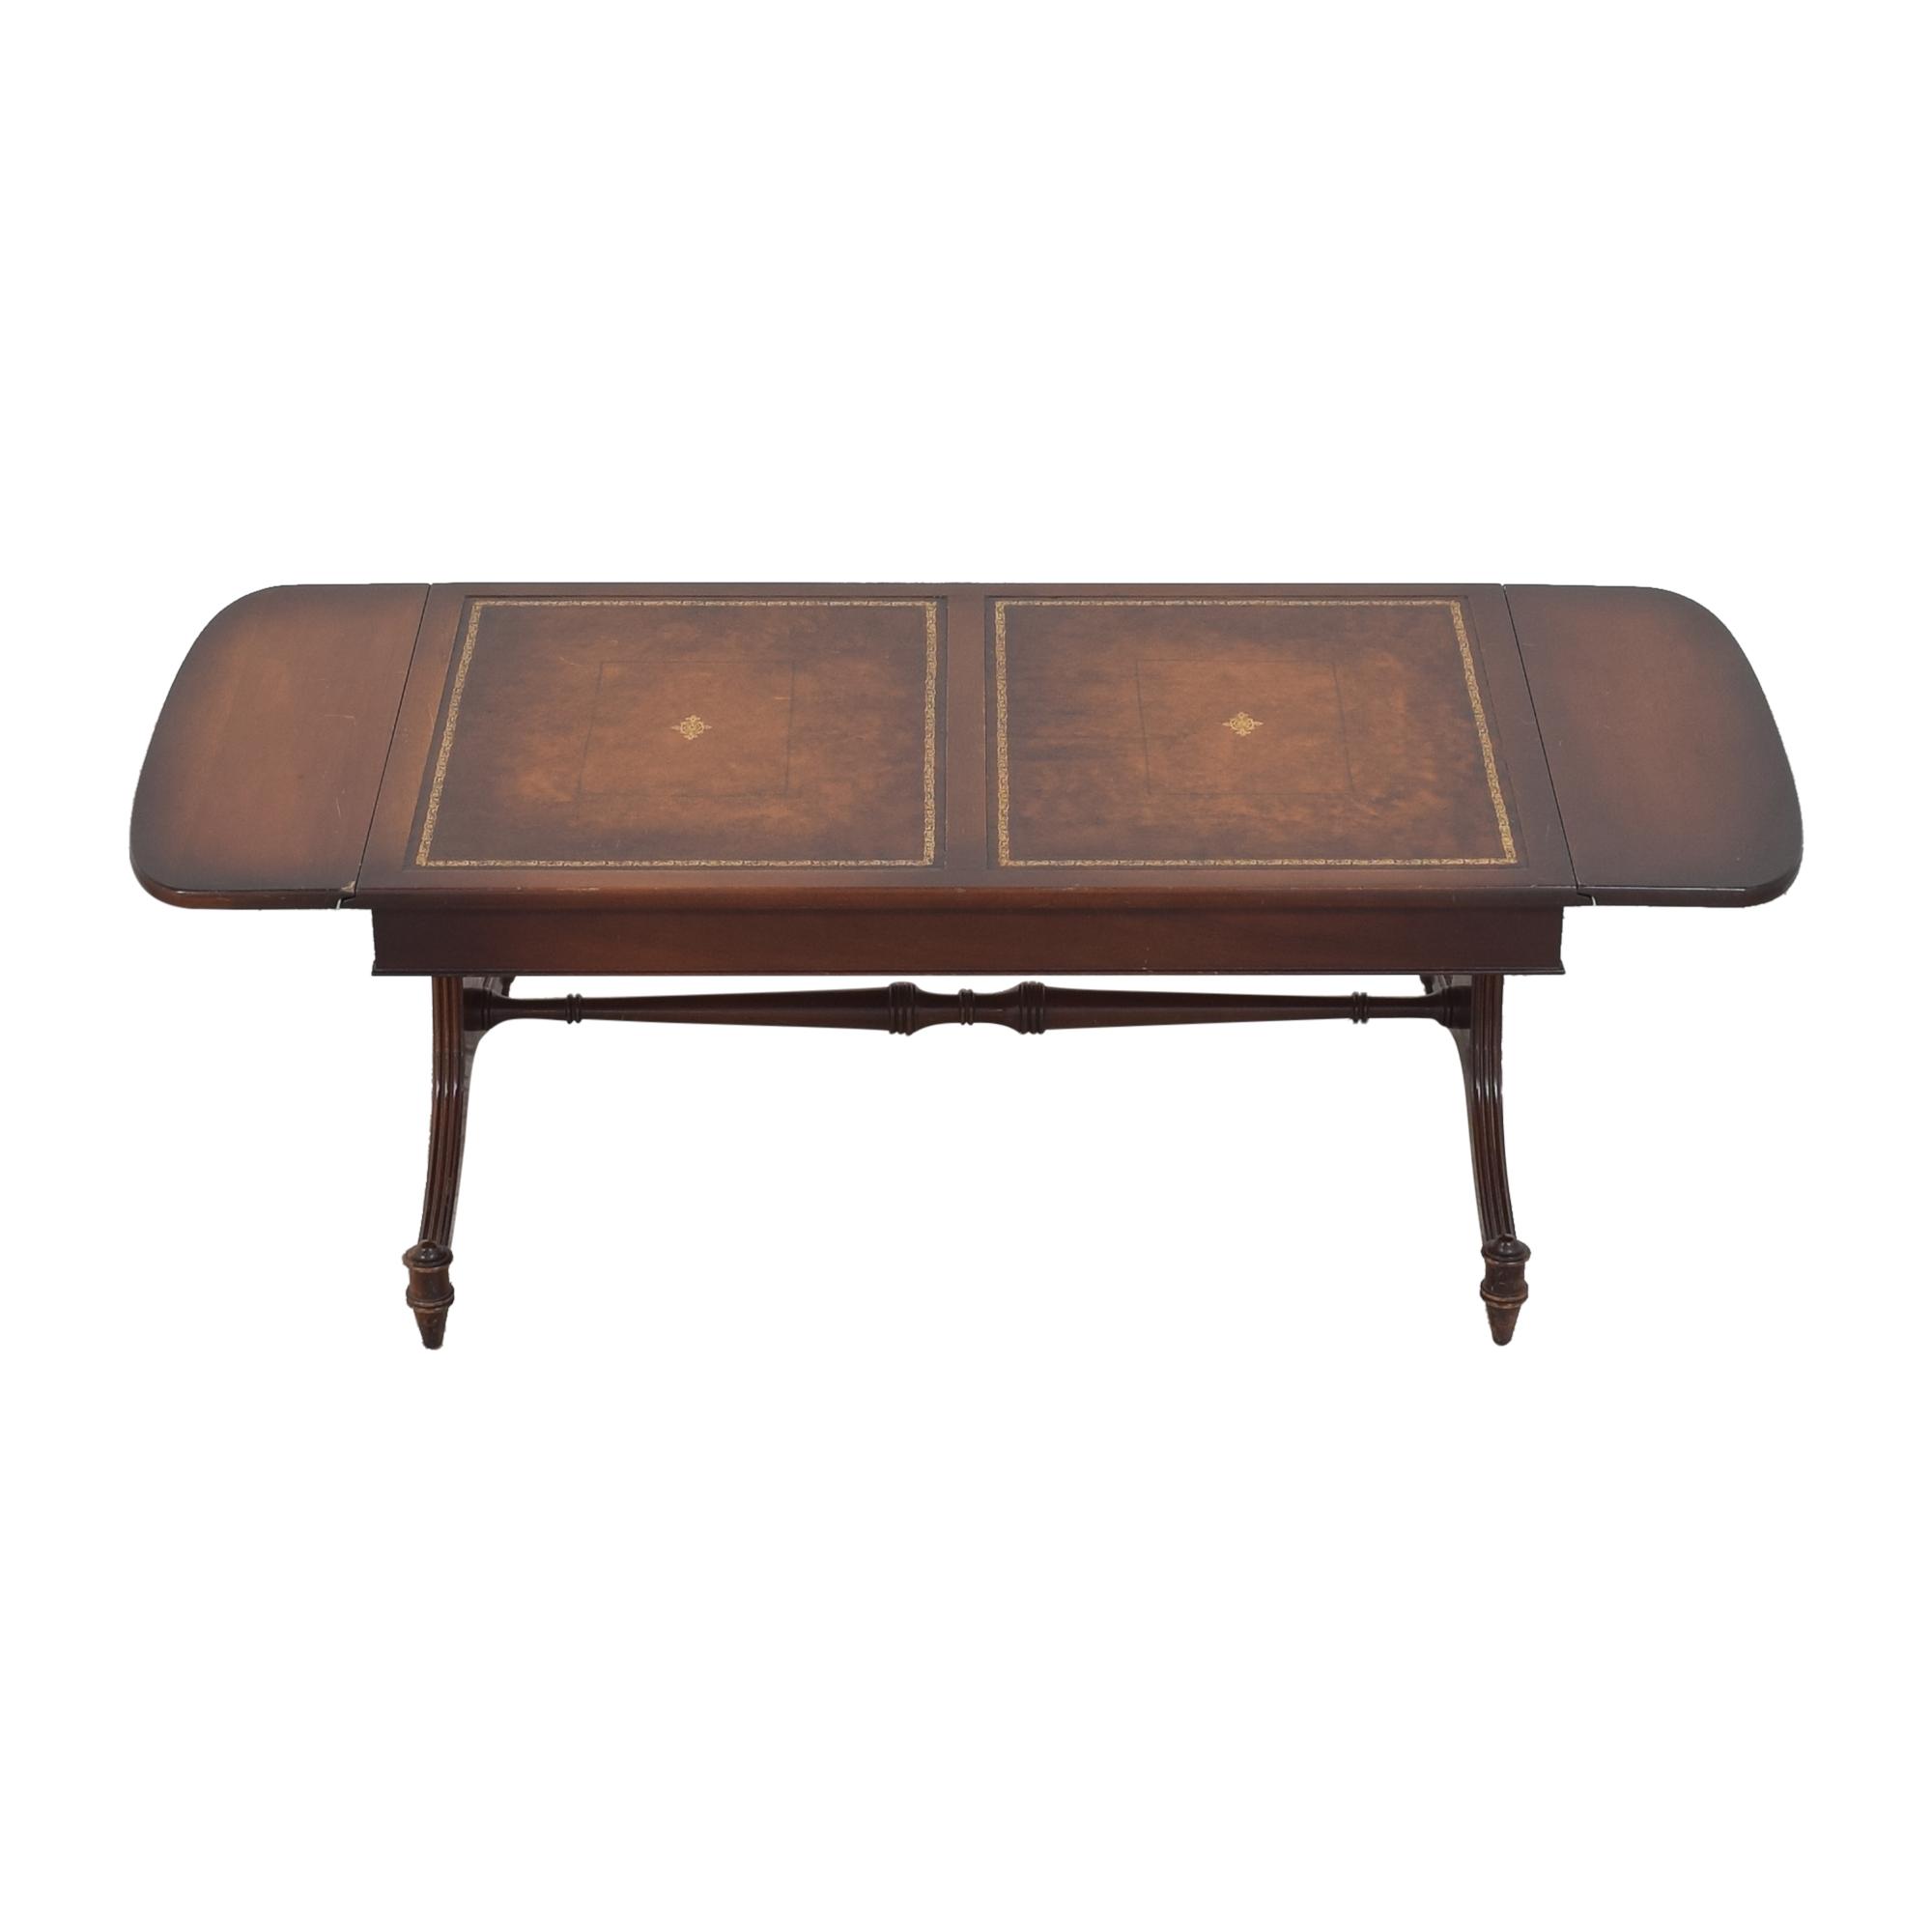 Gordon's Furniture Gordon's Furniture Drop Leaf Coffee Table